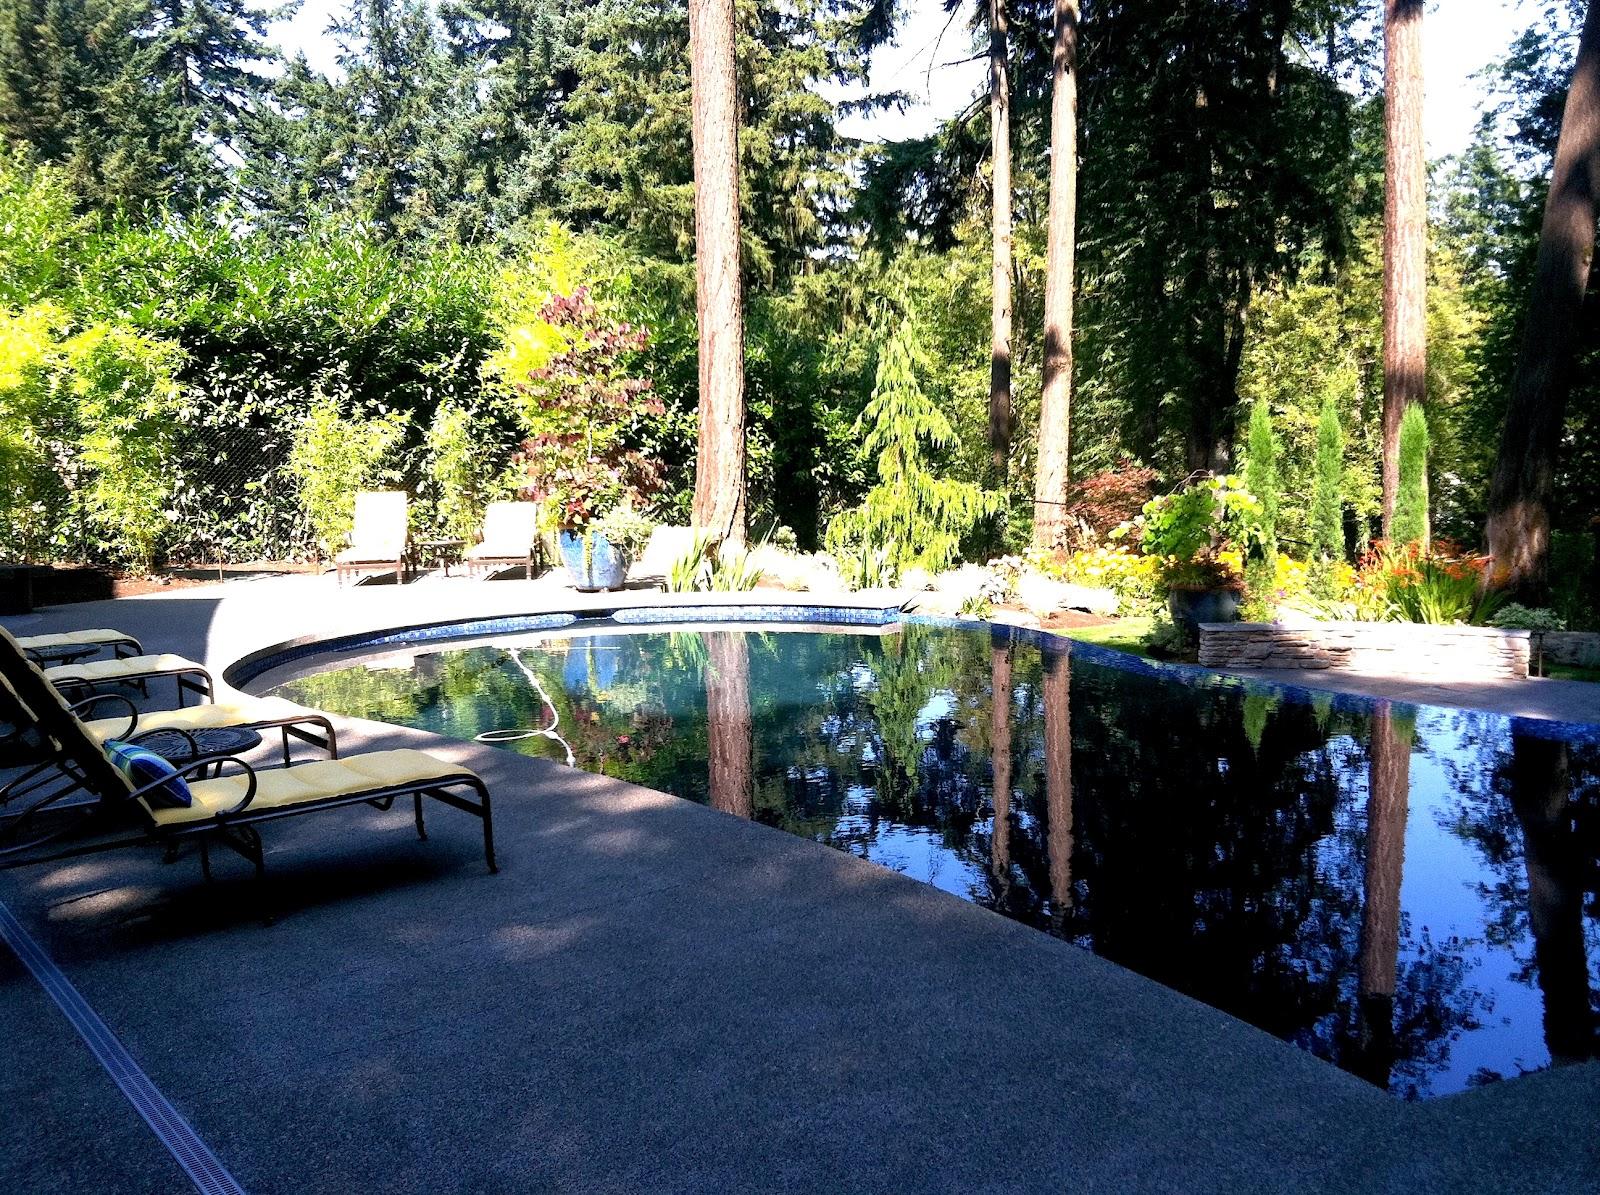 Portland Oregon Interior Design Blog: Lake Oswego swimming ... on Pool And Outdoor Living id=24473